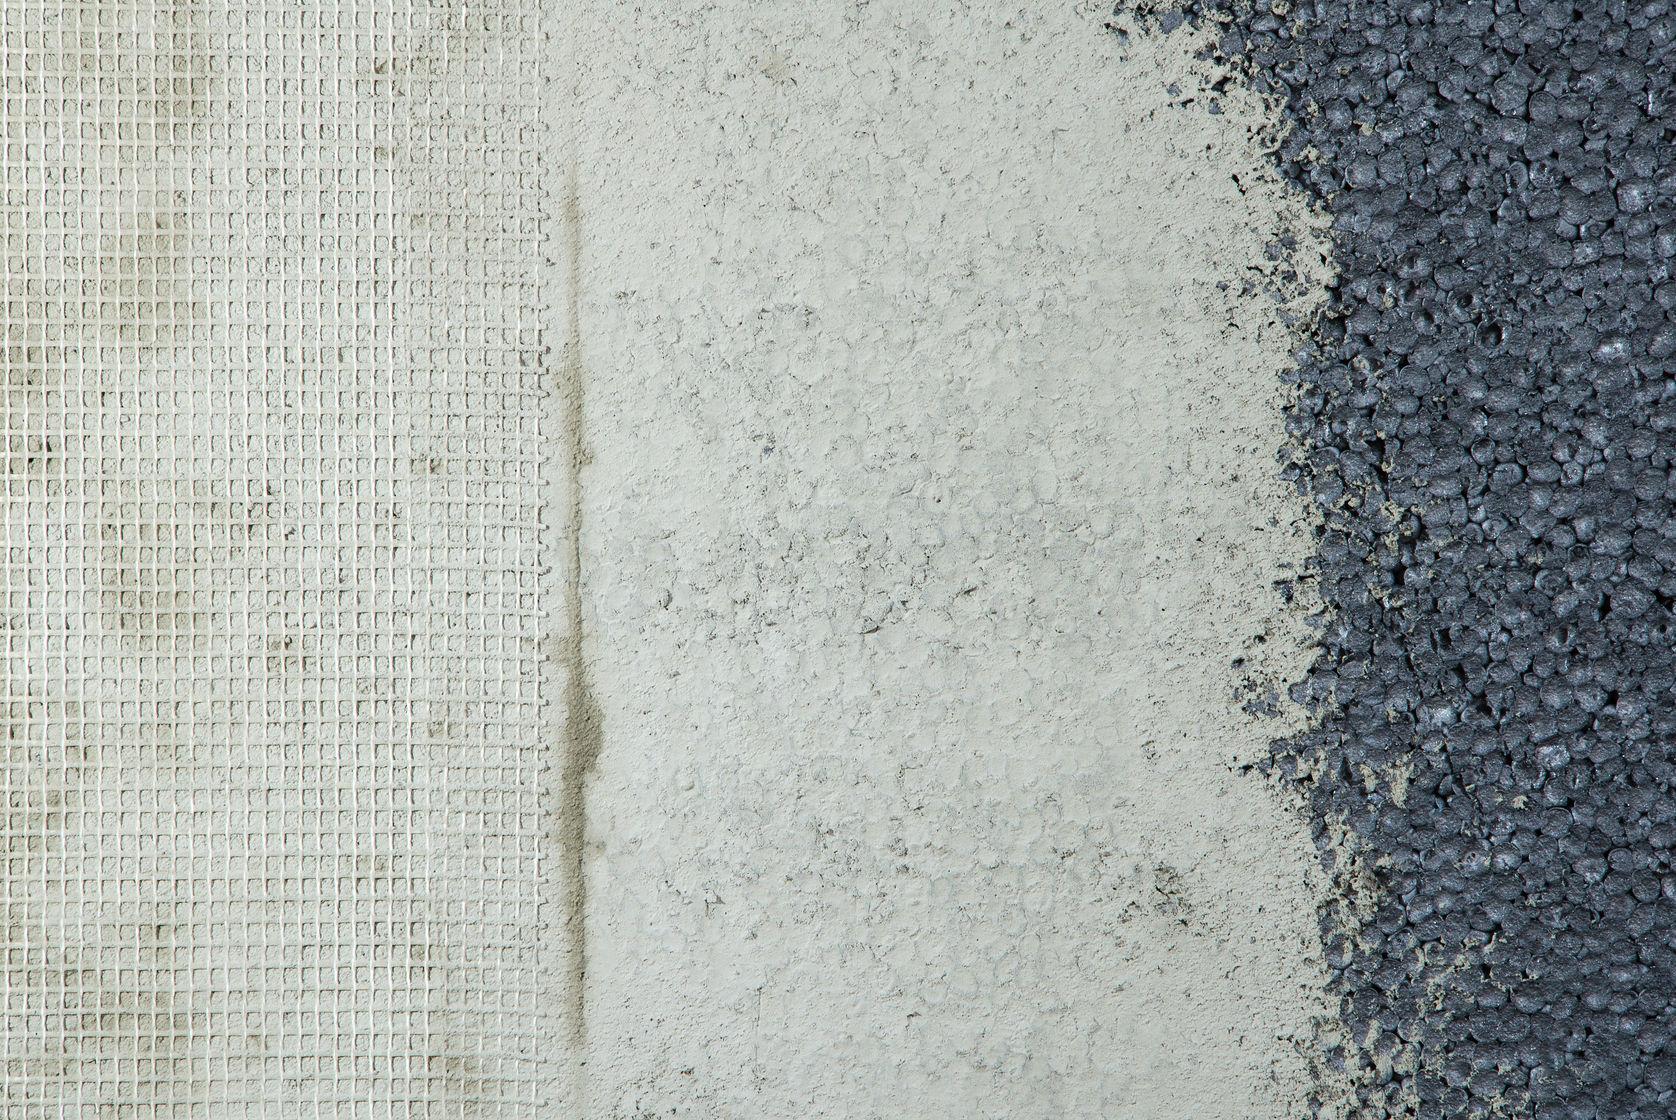 C mo podemos limpiar las paredes de diferentes tipos de - Como limpiar paredes ...